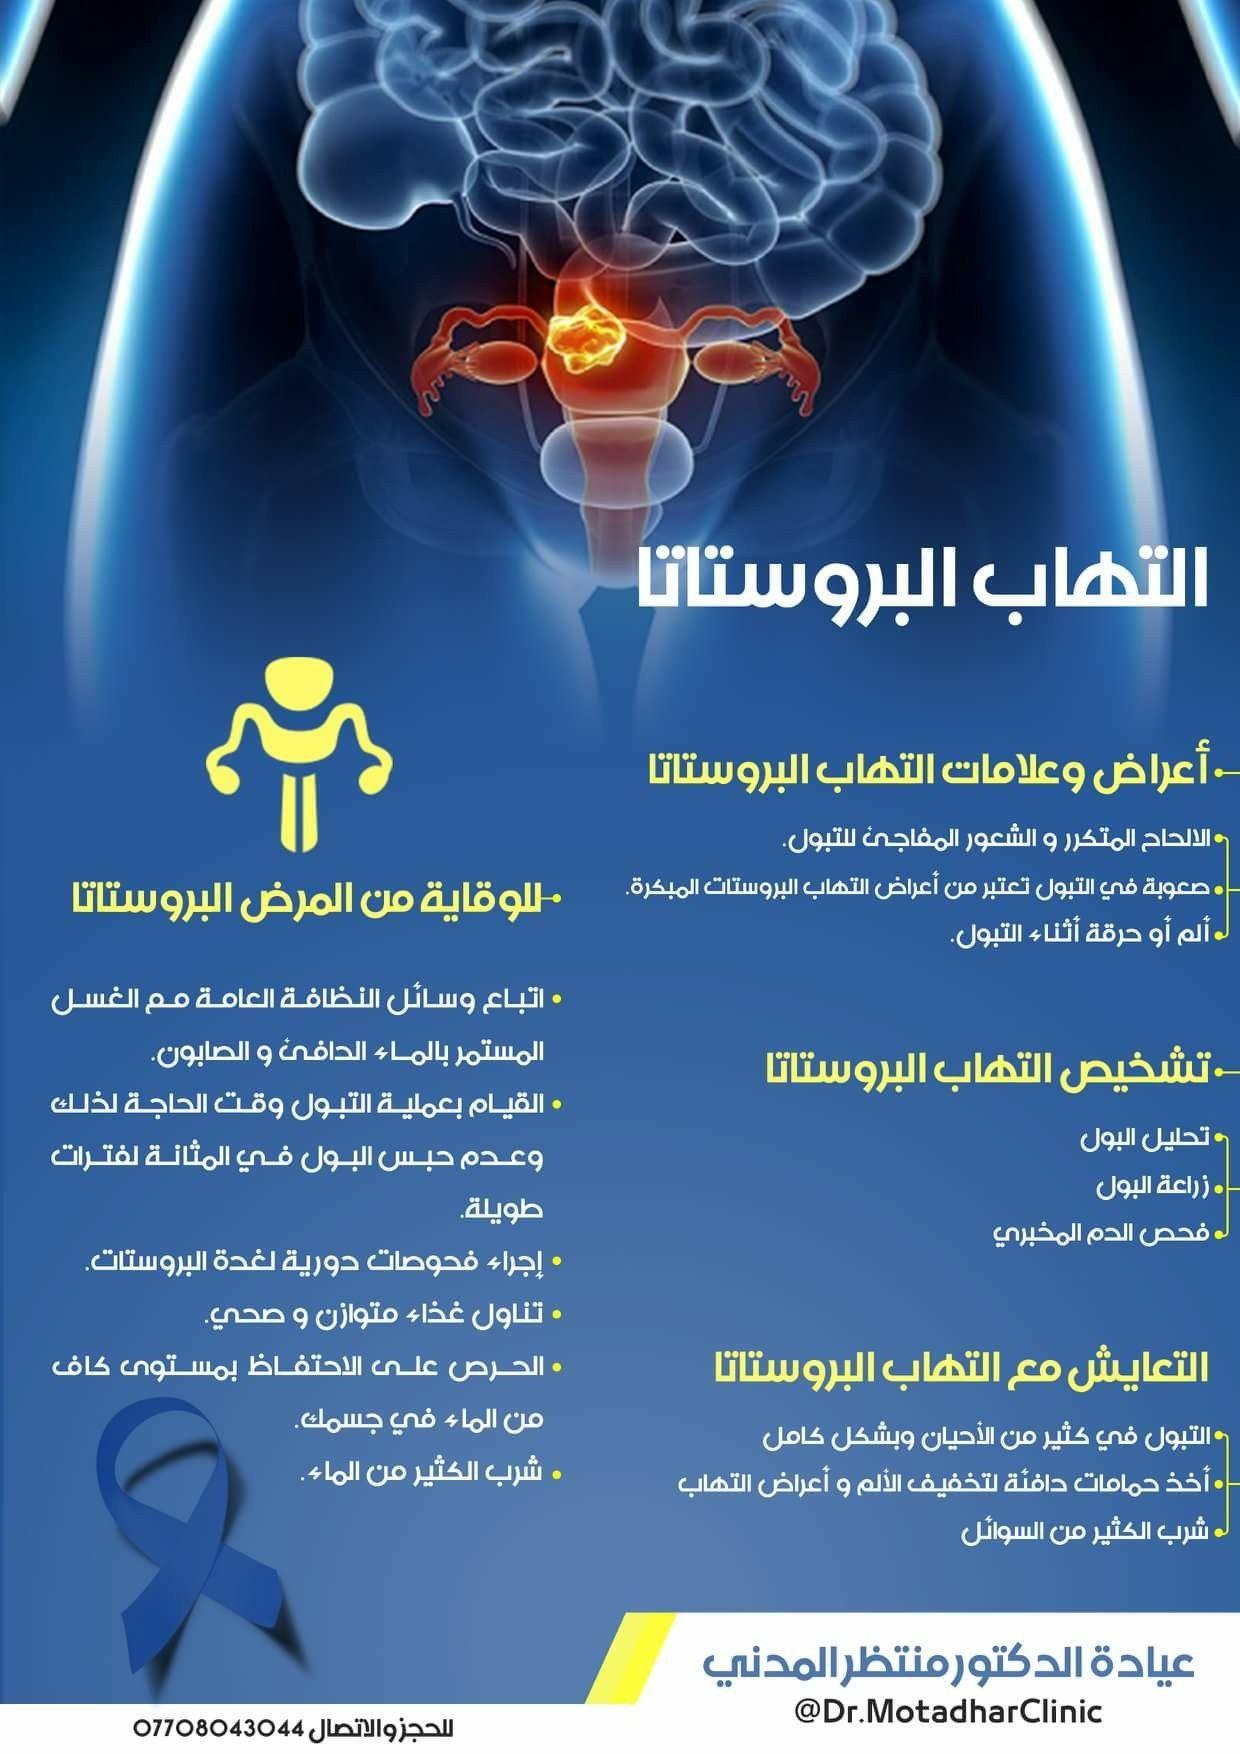 Pin By Suhail Najat On المعرفة Health Poster